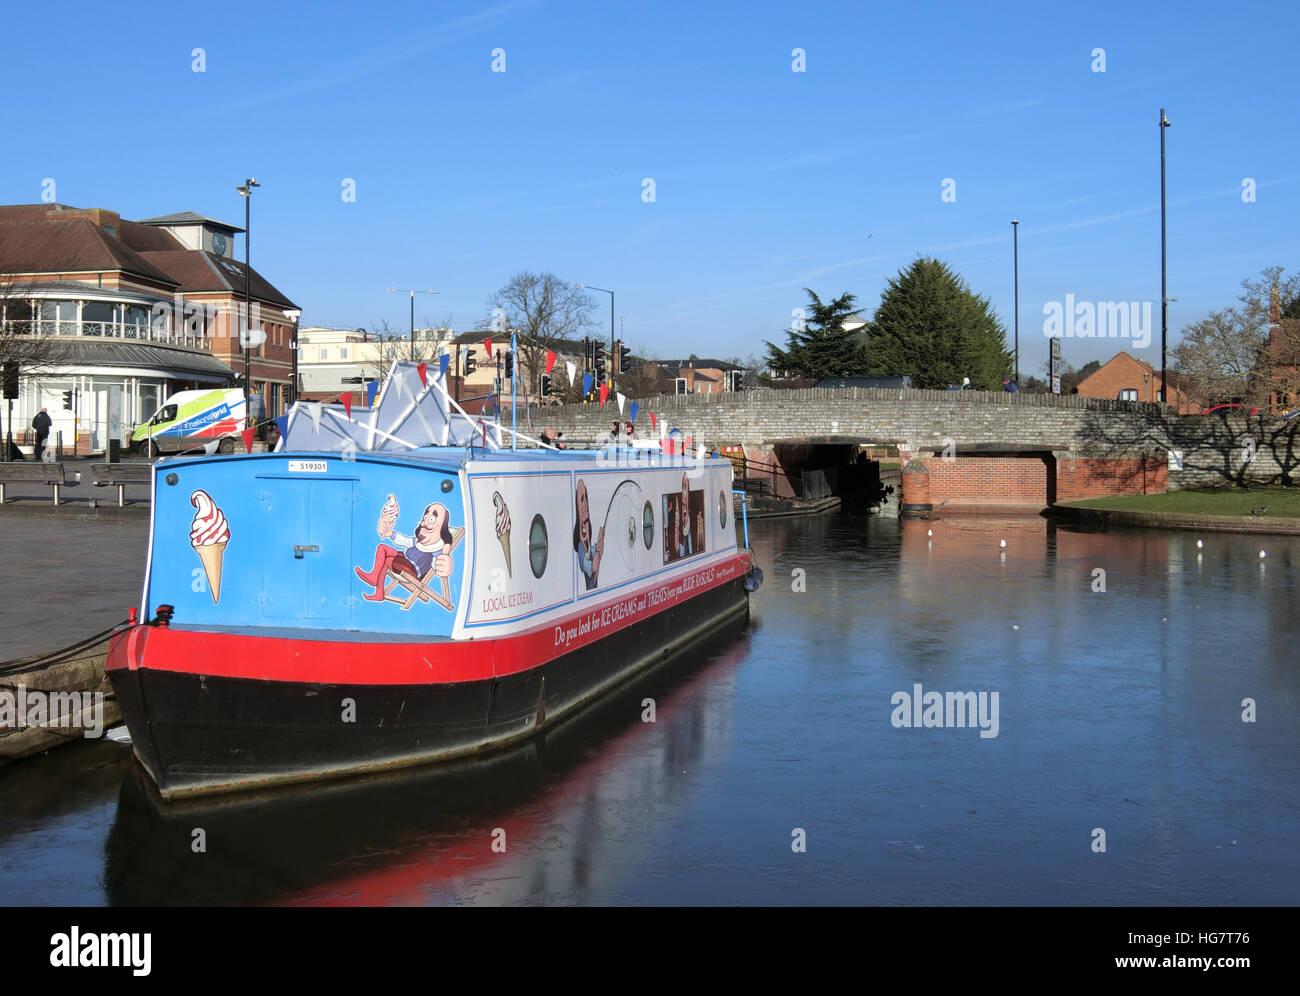 Bancroft Canal Basin, Stratford Upon Avon. Warwickshire, England, UK Stock Photo